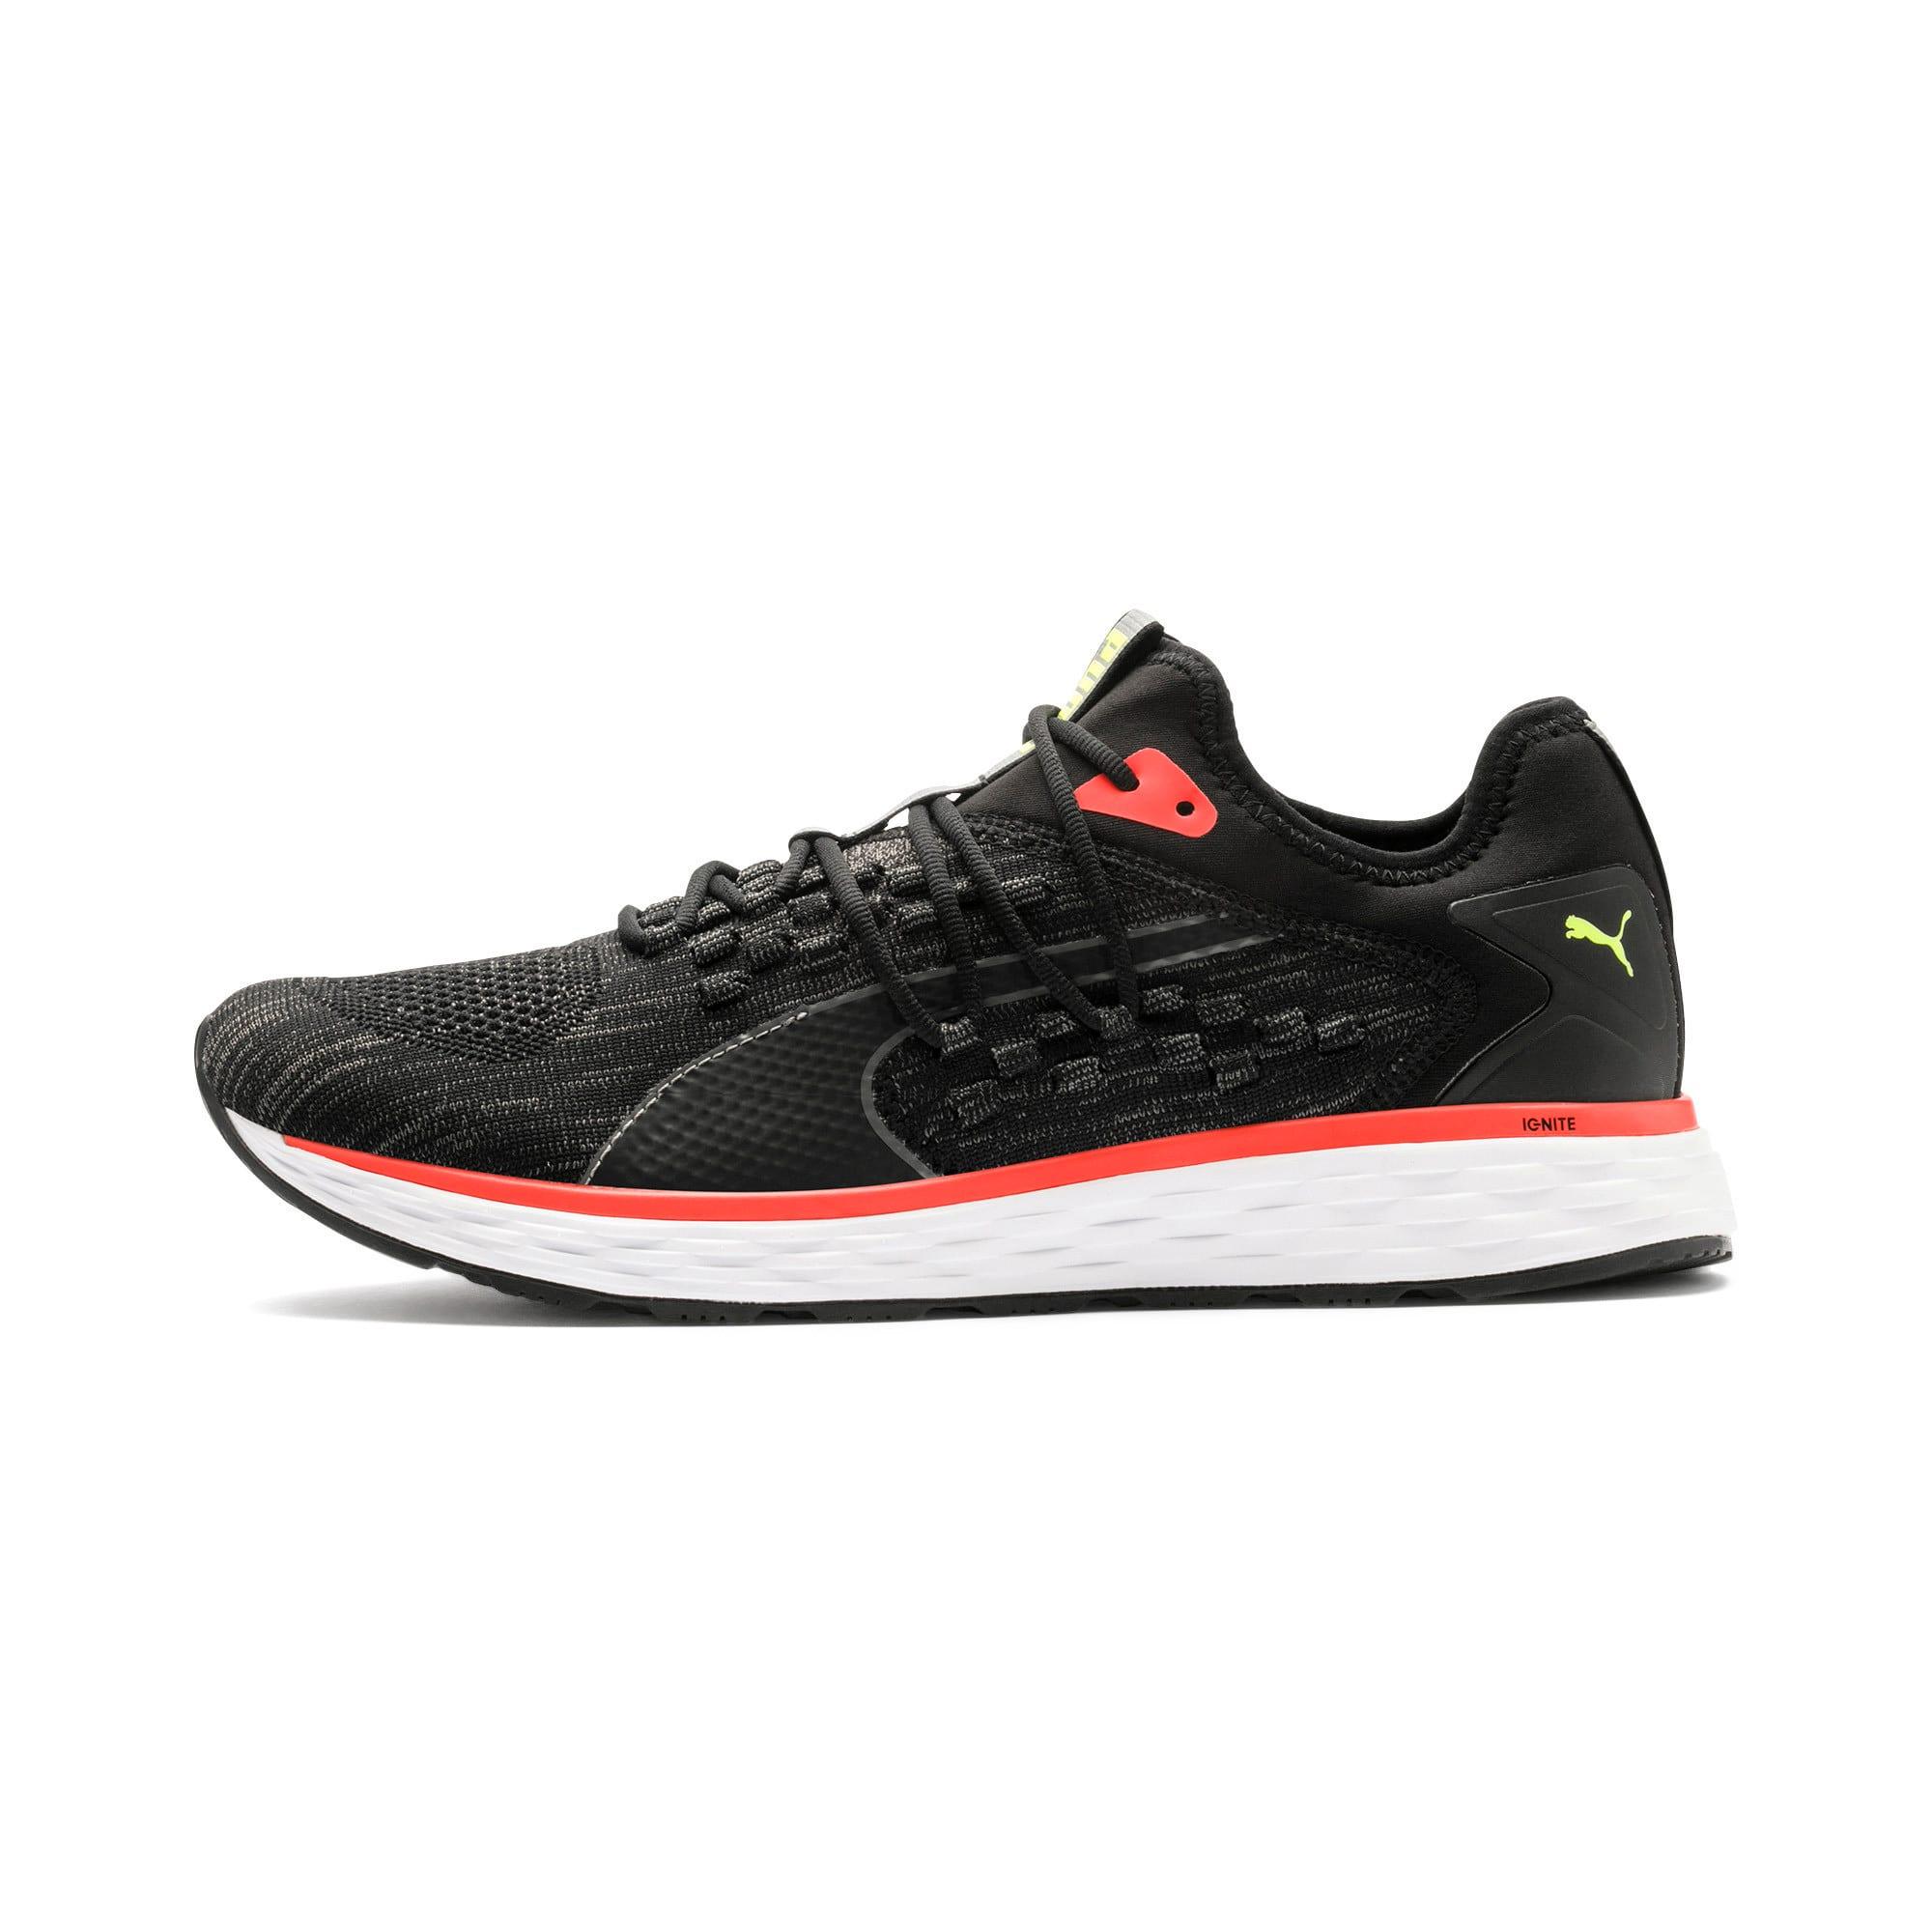 Thumbnail 1 of SPEED FUSEFIT Men's Running Shoes, Puma Black-Nrgy Red, medium